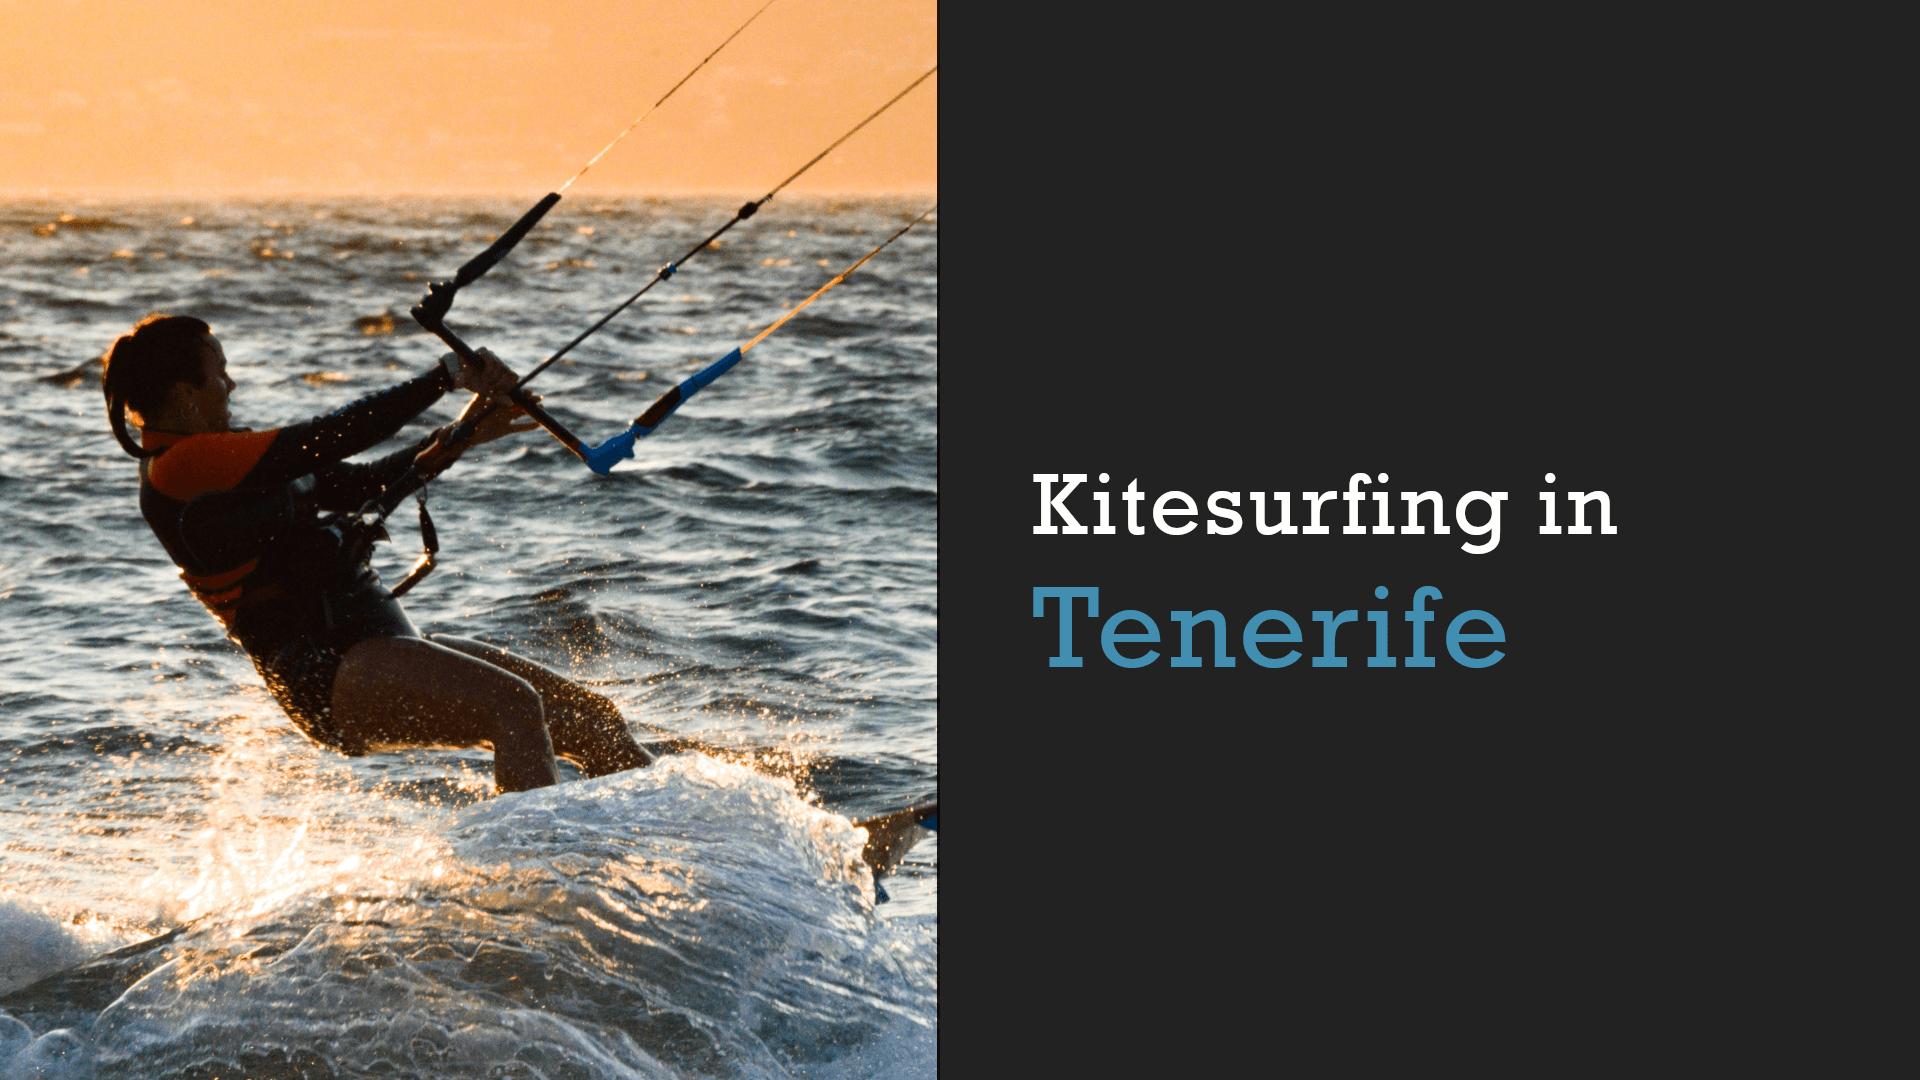 kitesurfing in tenerife